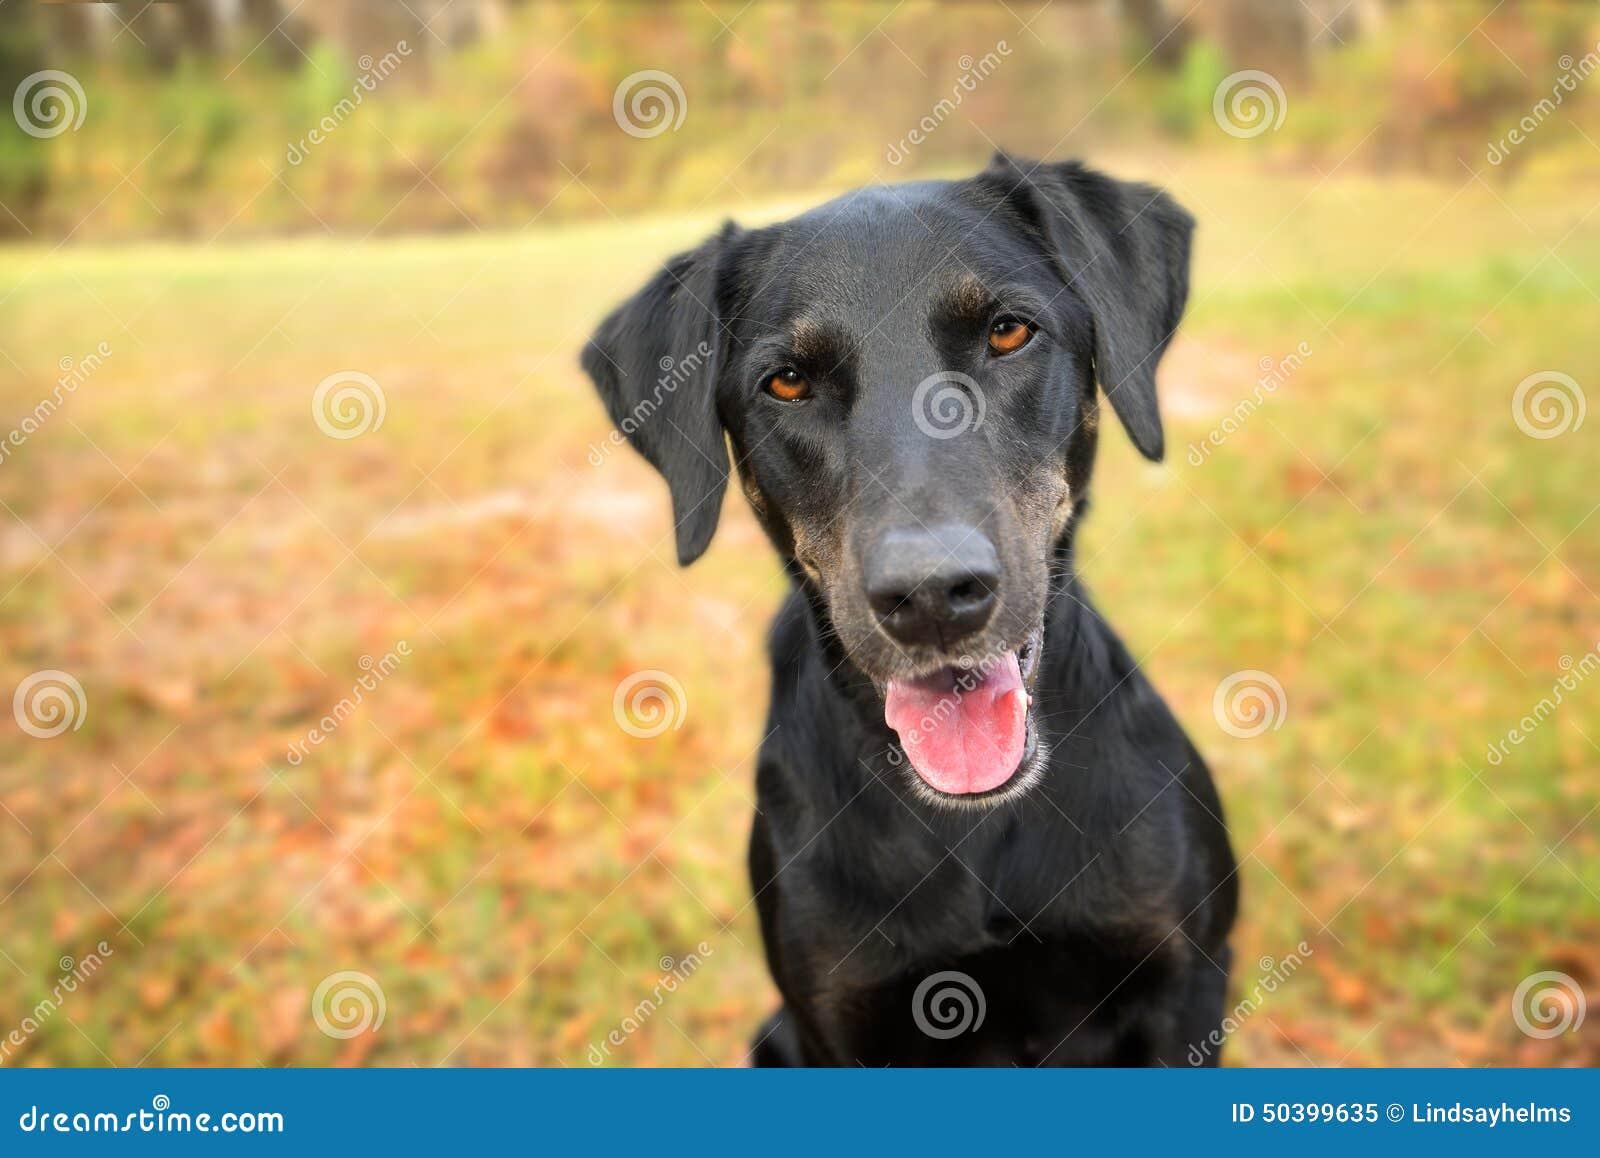 Black Dog Greyhound Collar